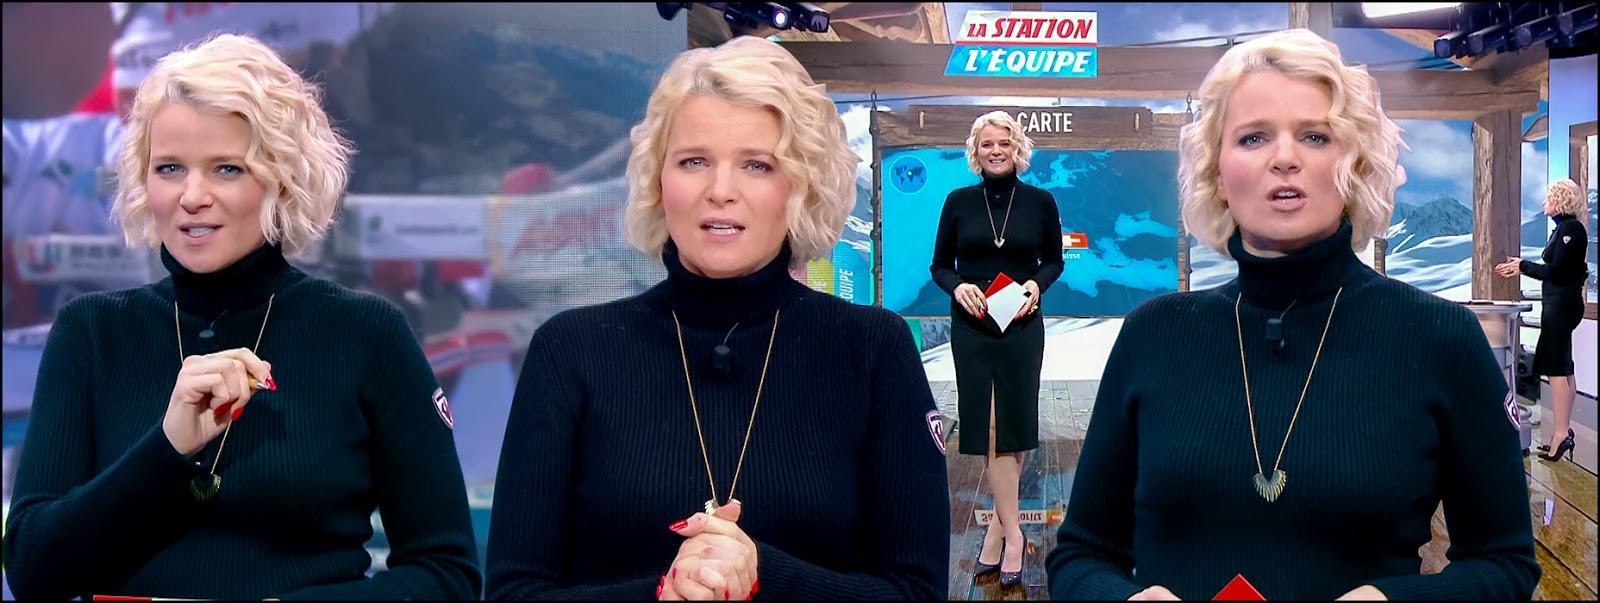 France Pierron